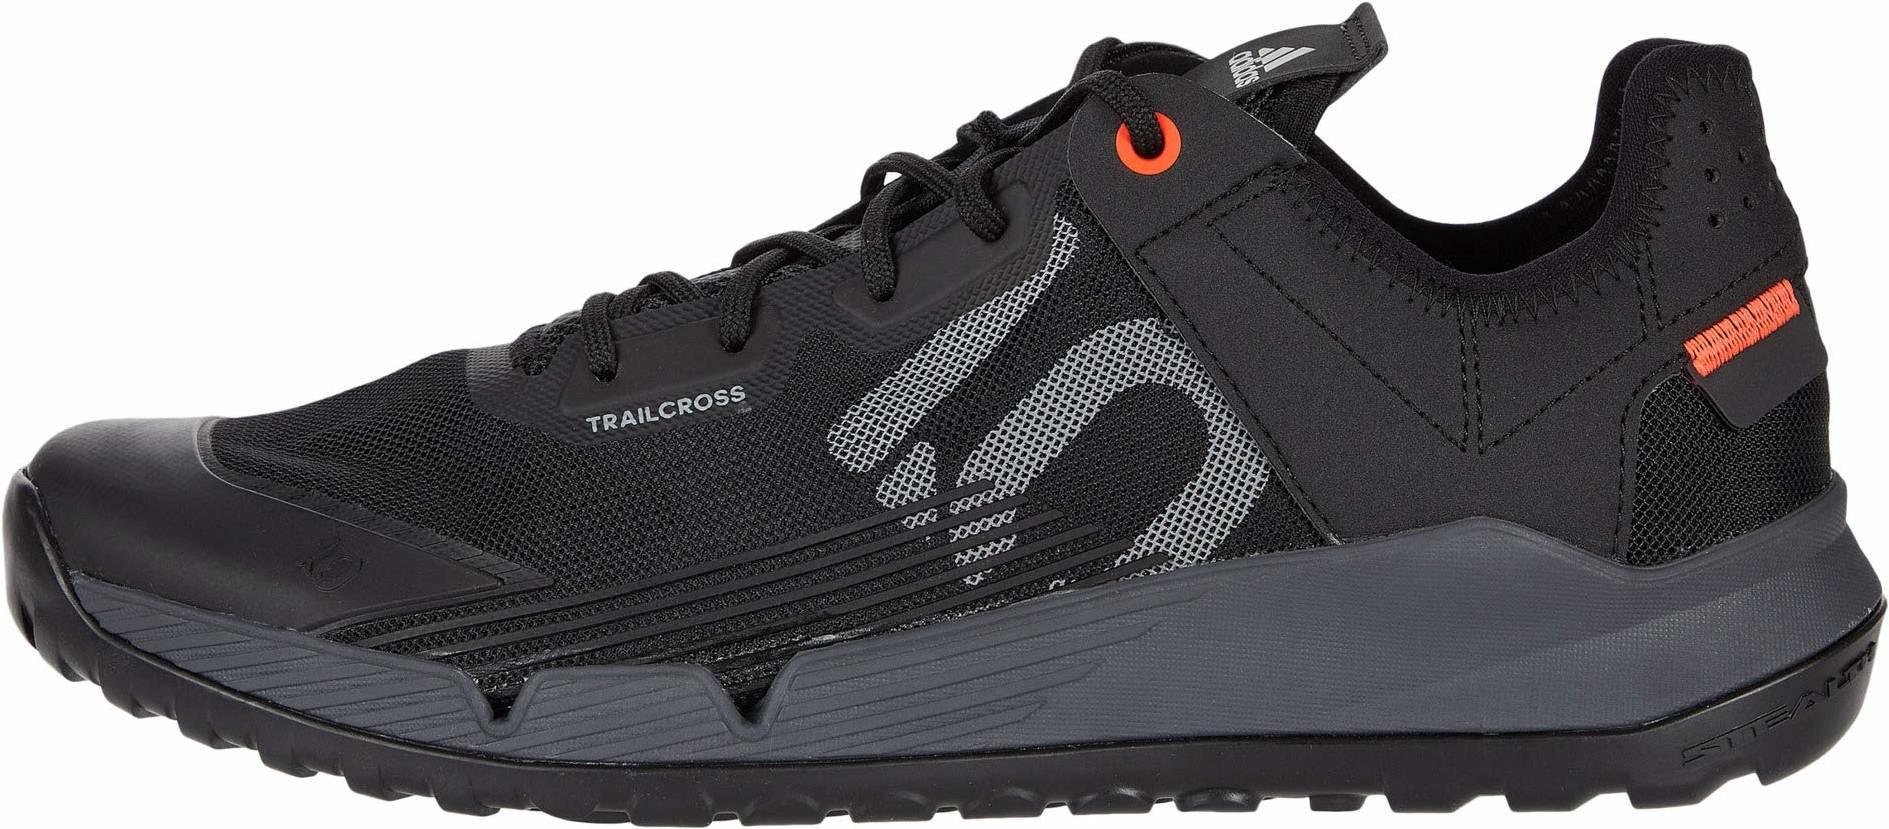 Five Ten Mens Trailcross LT Mountain Bike Shoes Black Sports Breathable